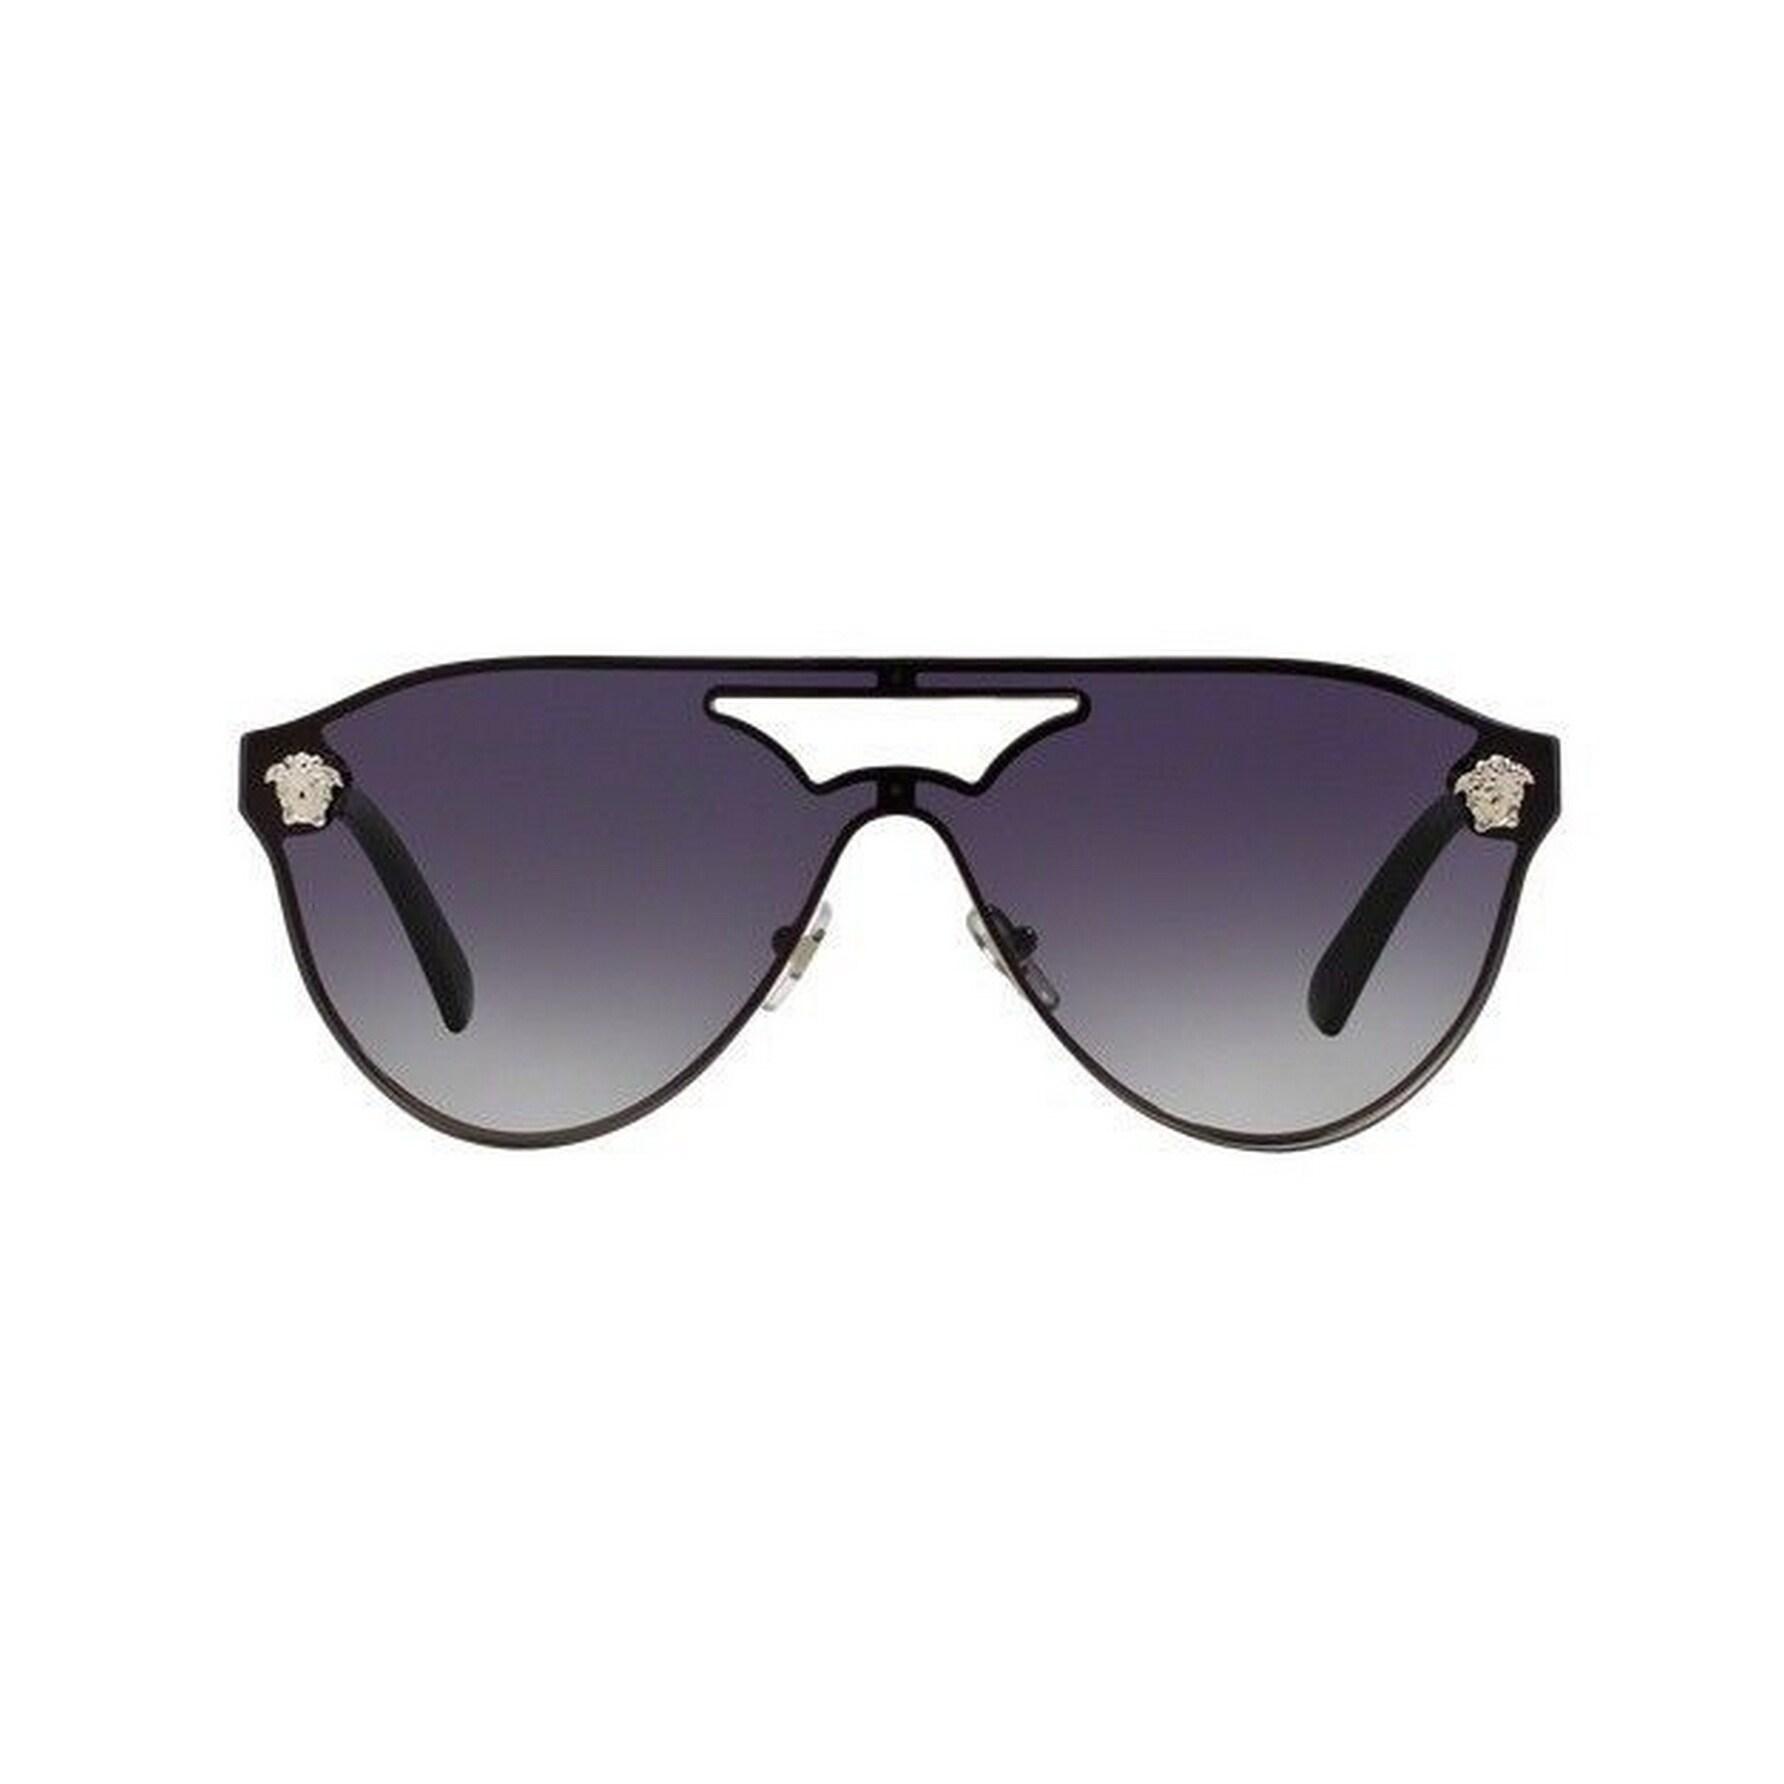 d50459ffbb6 Shop Versace Women s VE2161 10008G 42 Aviator Metal Plastic Grey Sunglasses  - Free Shipping Today - Overstock.com - 14692040